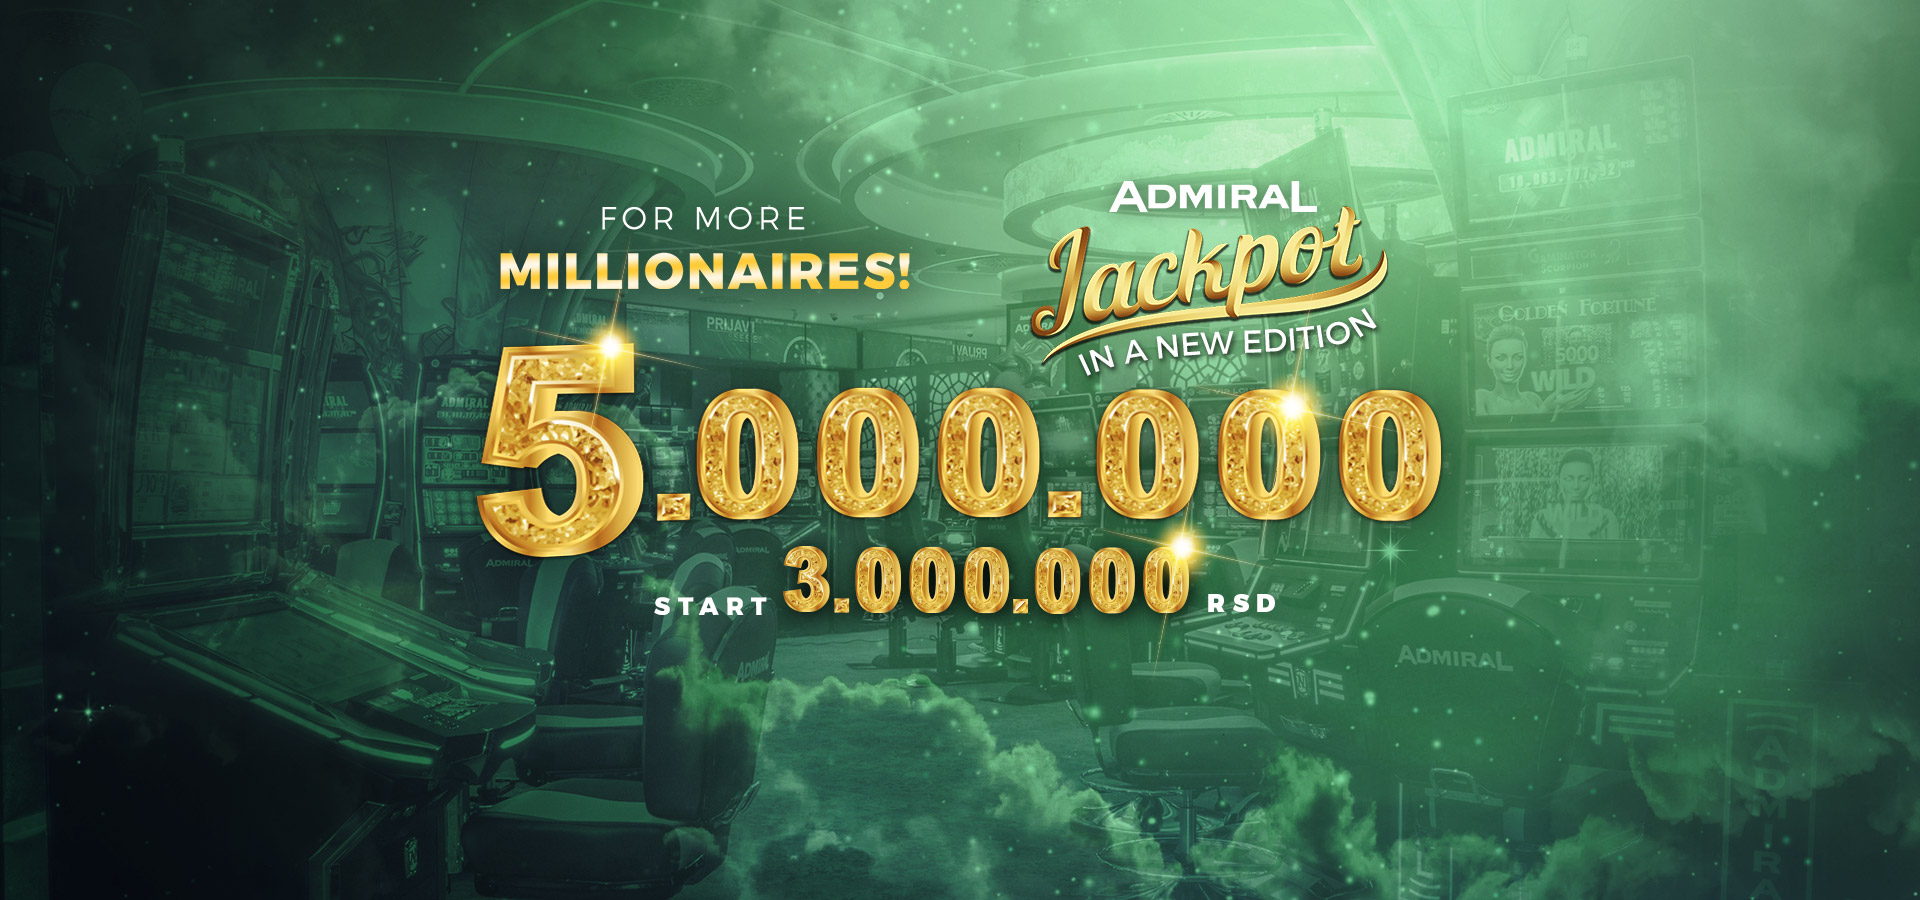 Admiral Jackpot